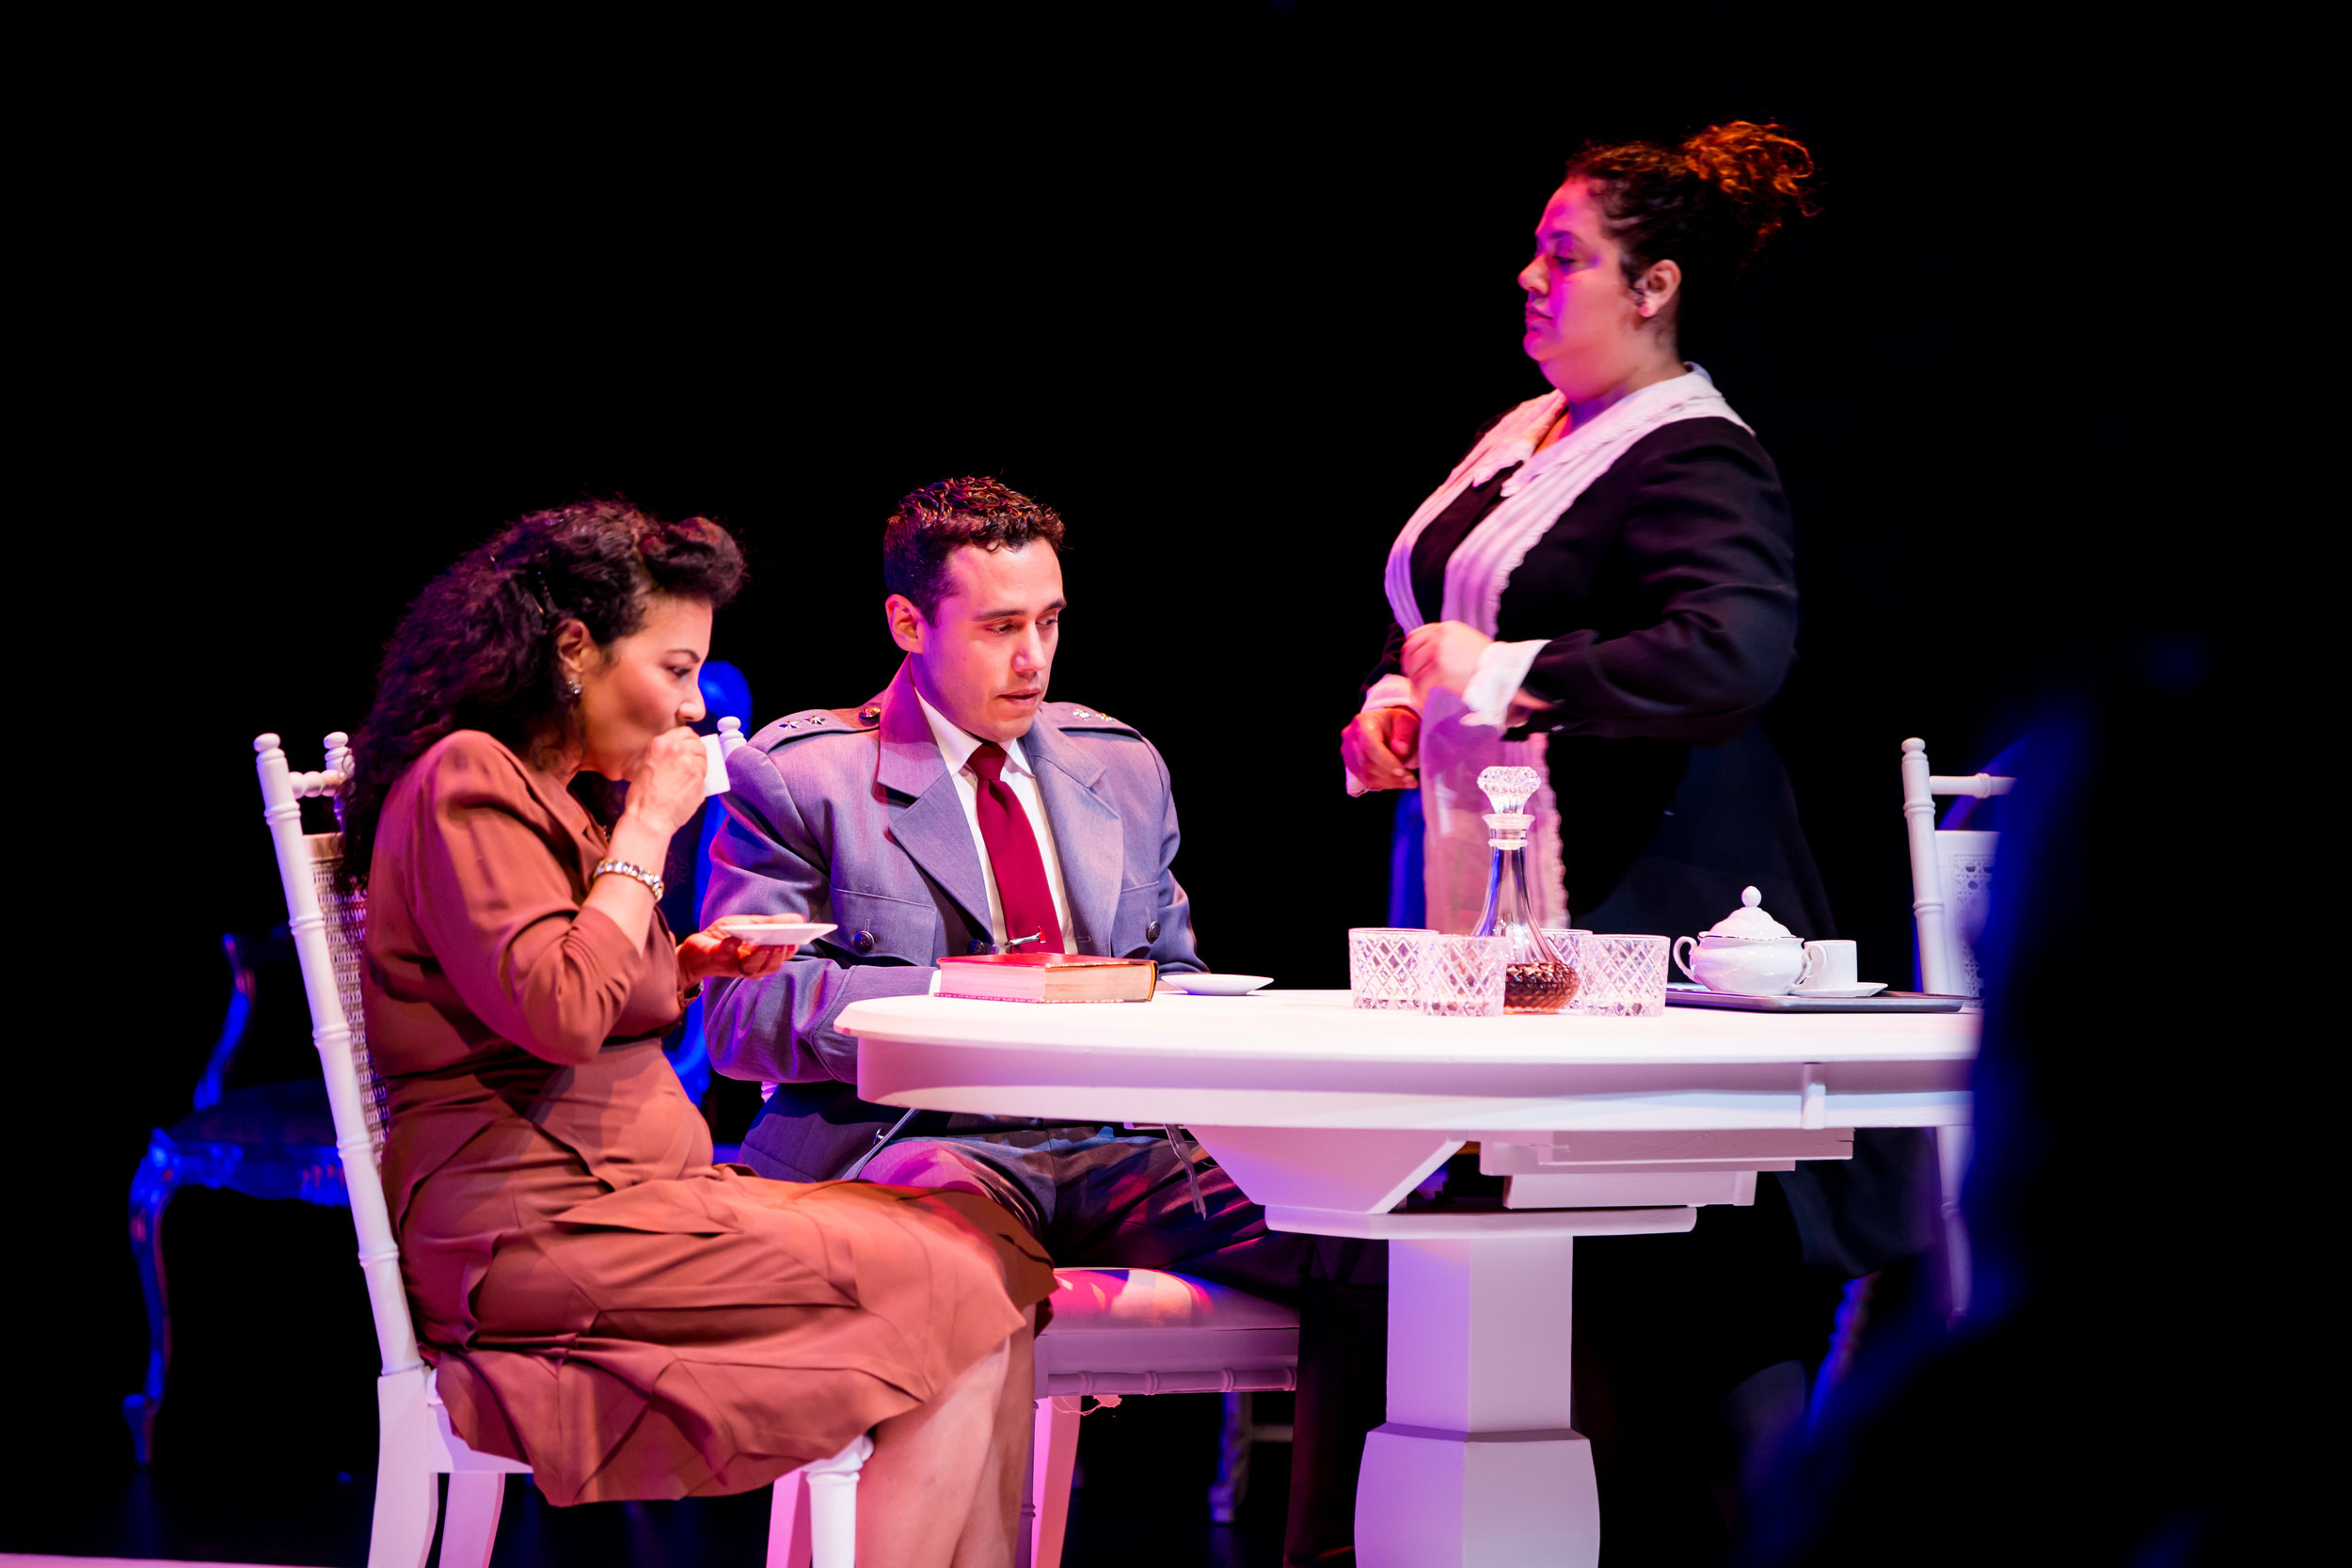 Hero-Theater-Final_17-06-11-0093.jpg